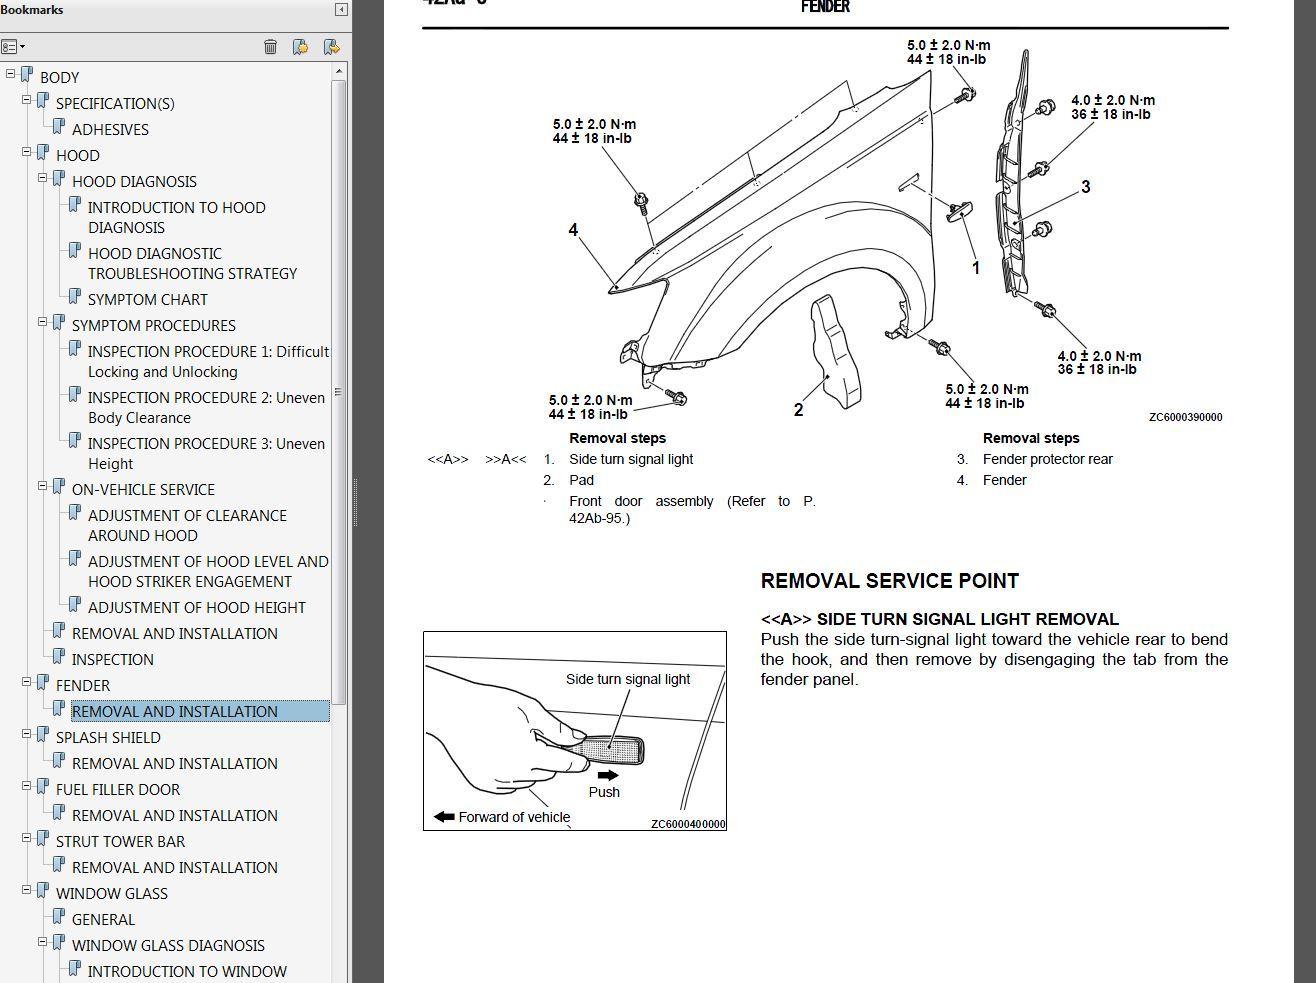 2007 Mitsubishi Outlander Factory Repair Service Manual